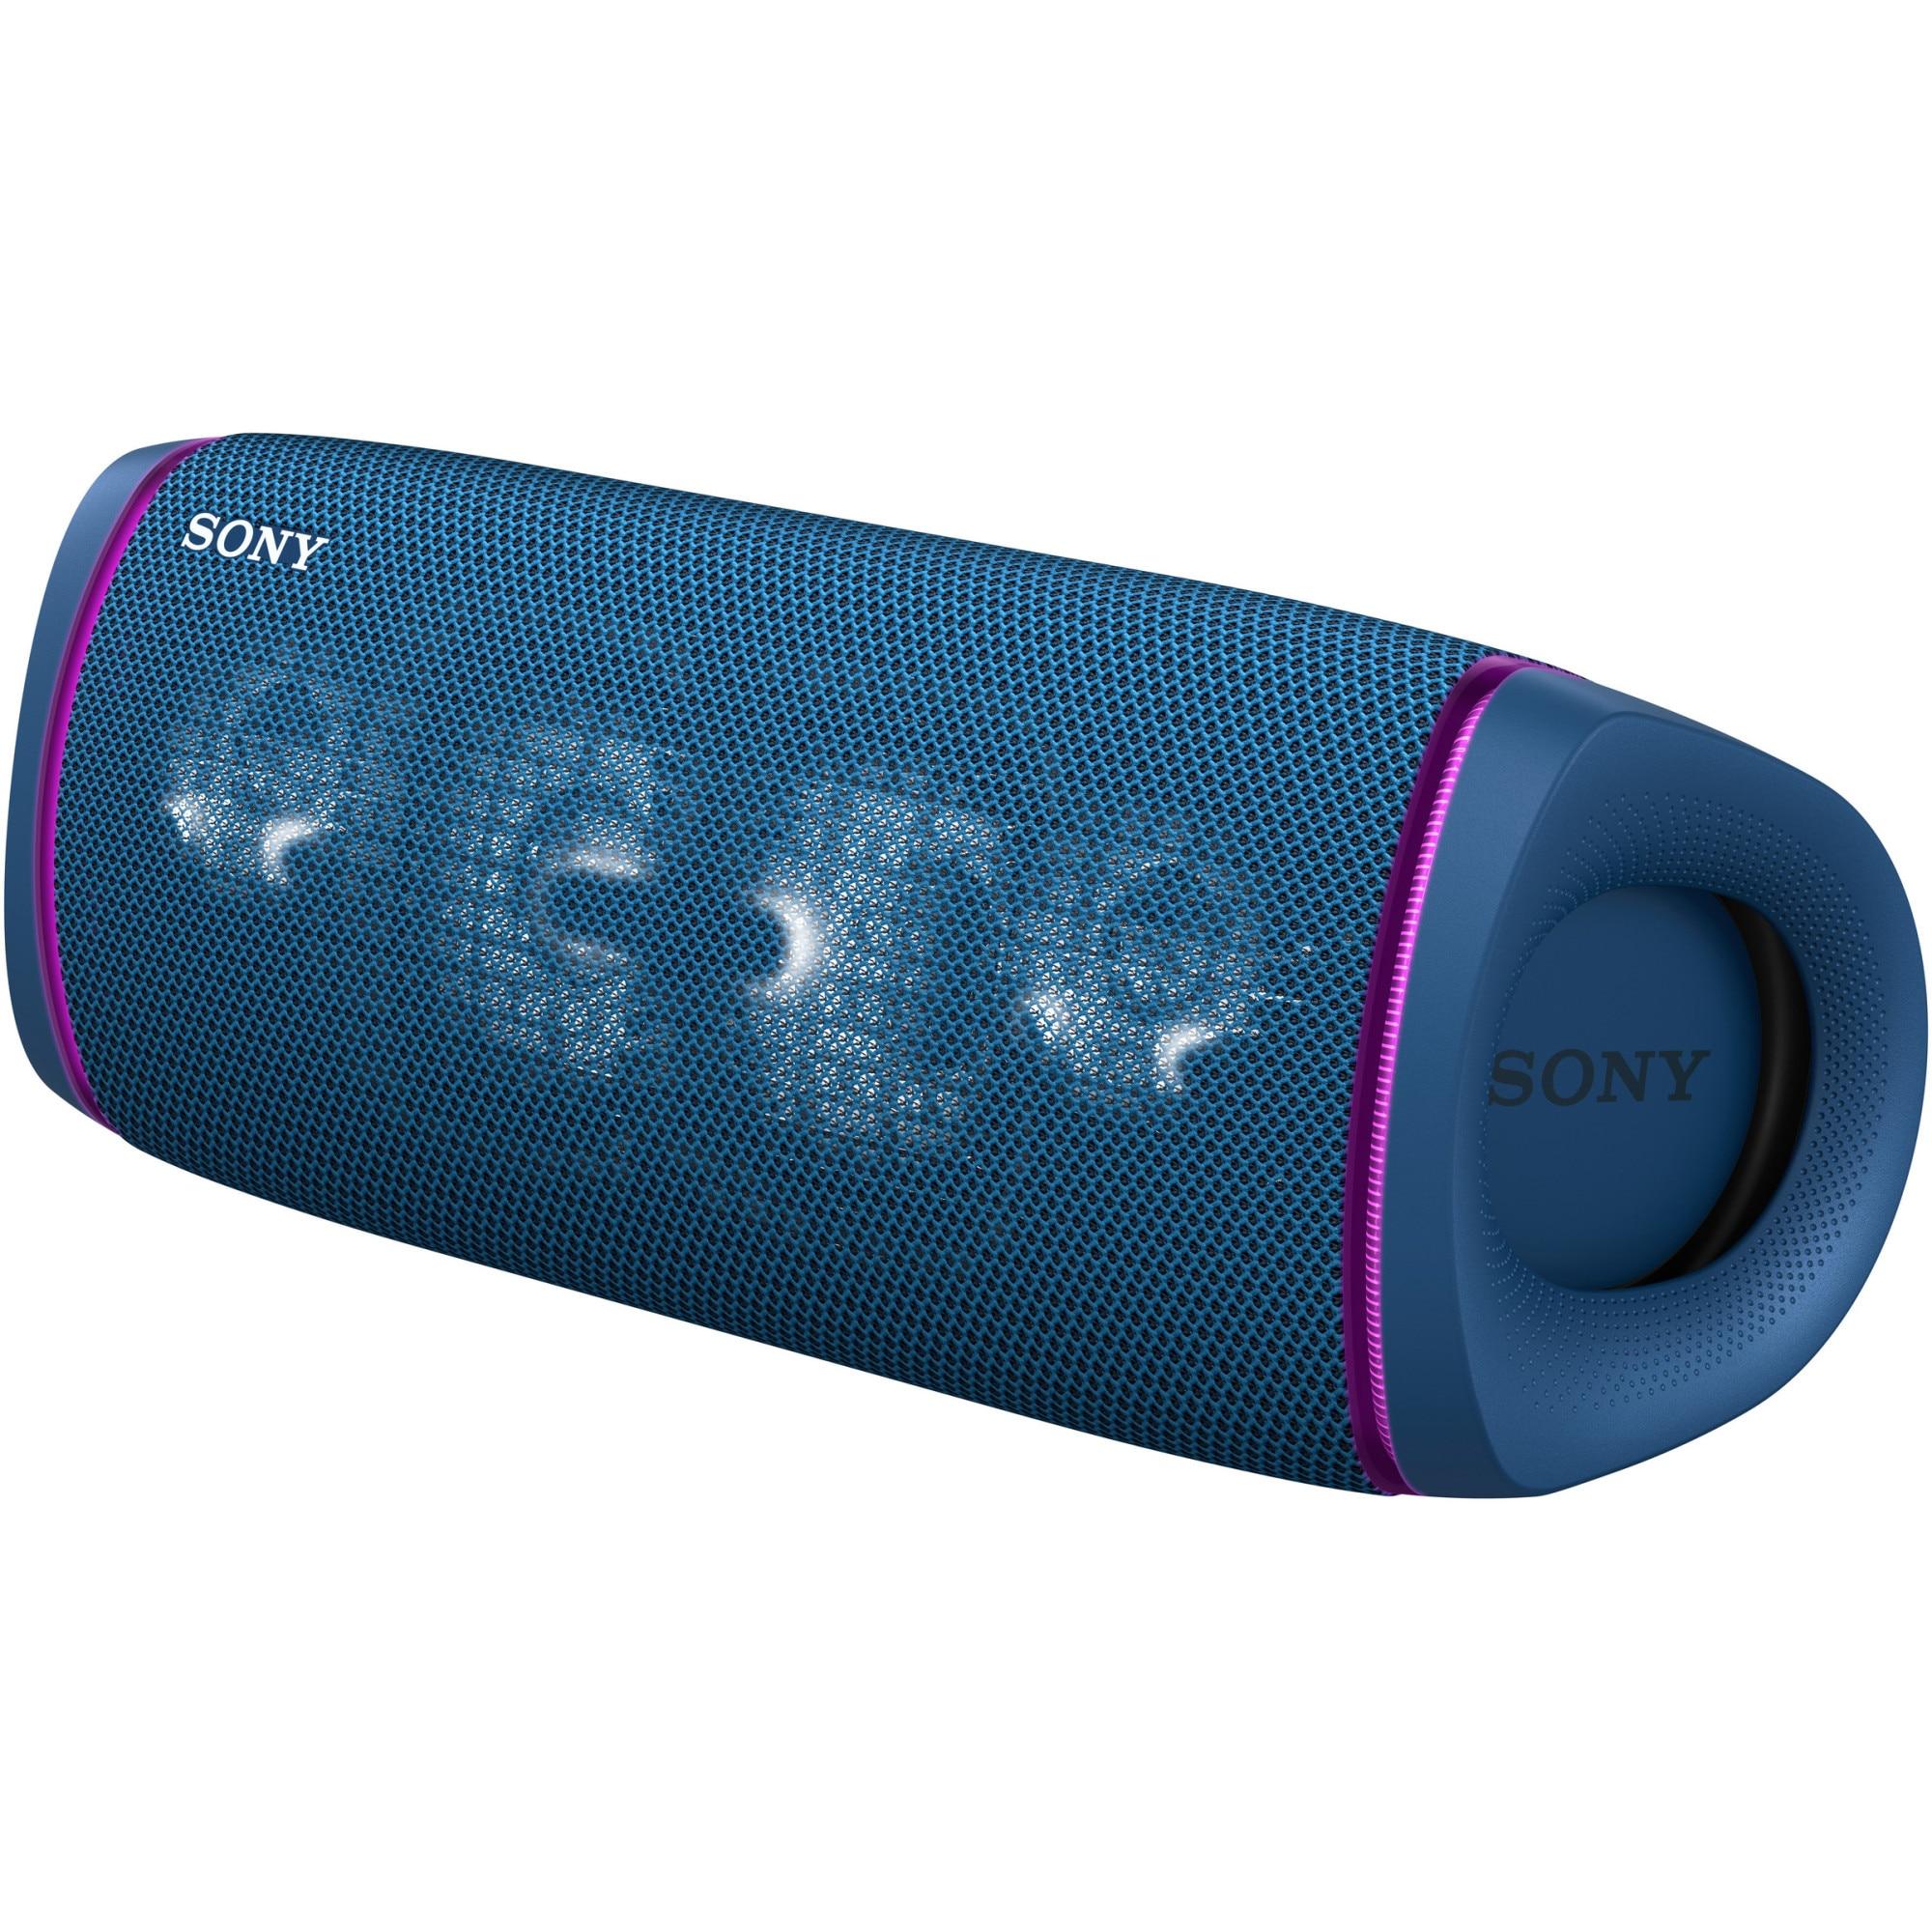 Fotografie Boxa portabila Sony SRS-XB43L, Extra Bass, Efect de lumini, Rezistenta la apa IP67, Bluetooth 5.0, NFC, Autonomie 24 ore, Microfon, USB Type-C, Albastru